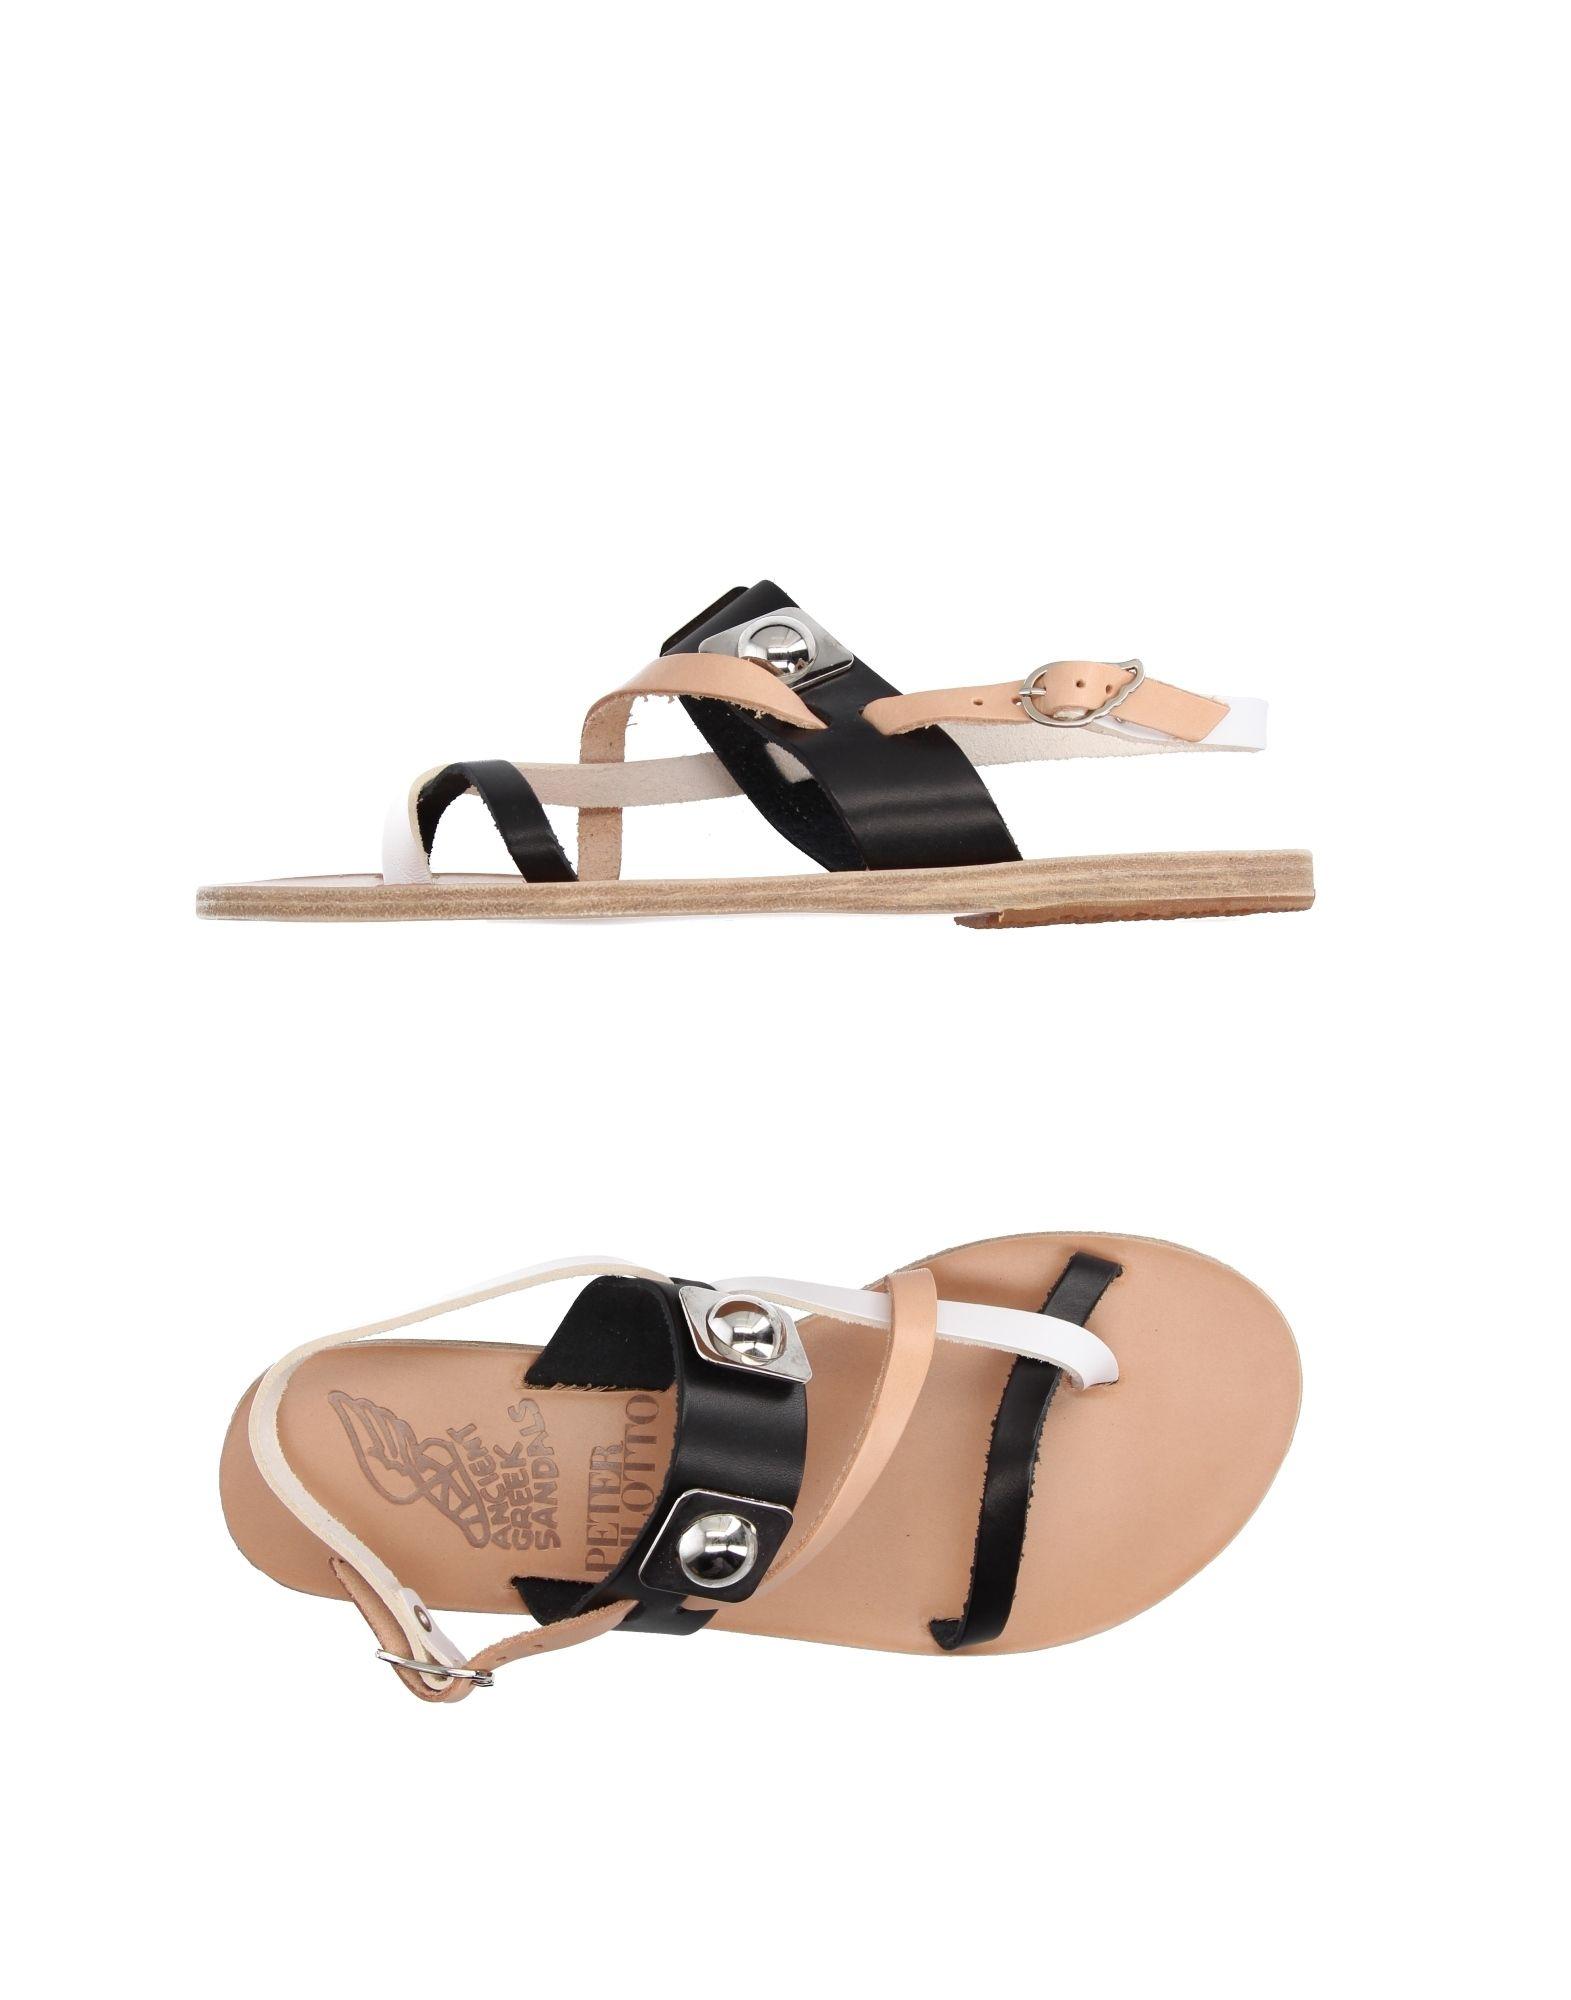 Tongs Ancient Greek Sandals X Peter Pilotto Femme - Tongs Ancient Greek Sandals X Peter Pilotto sur